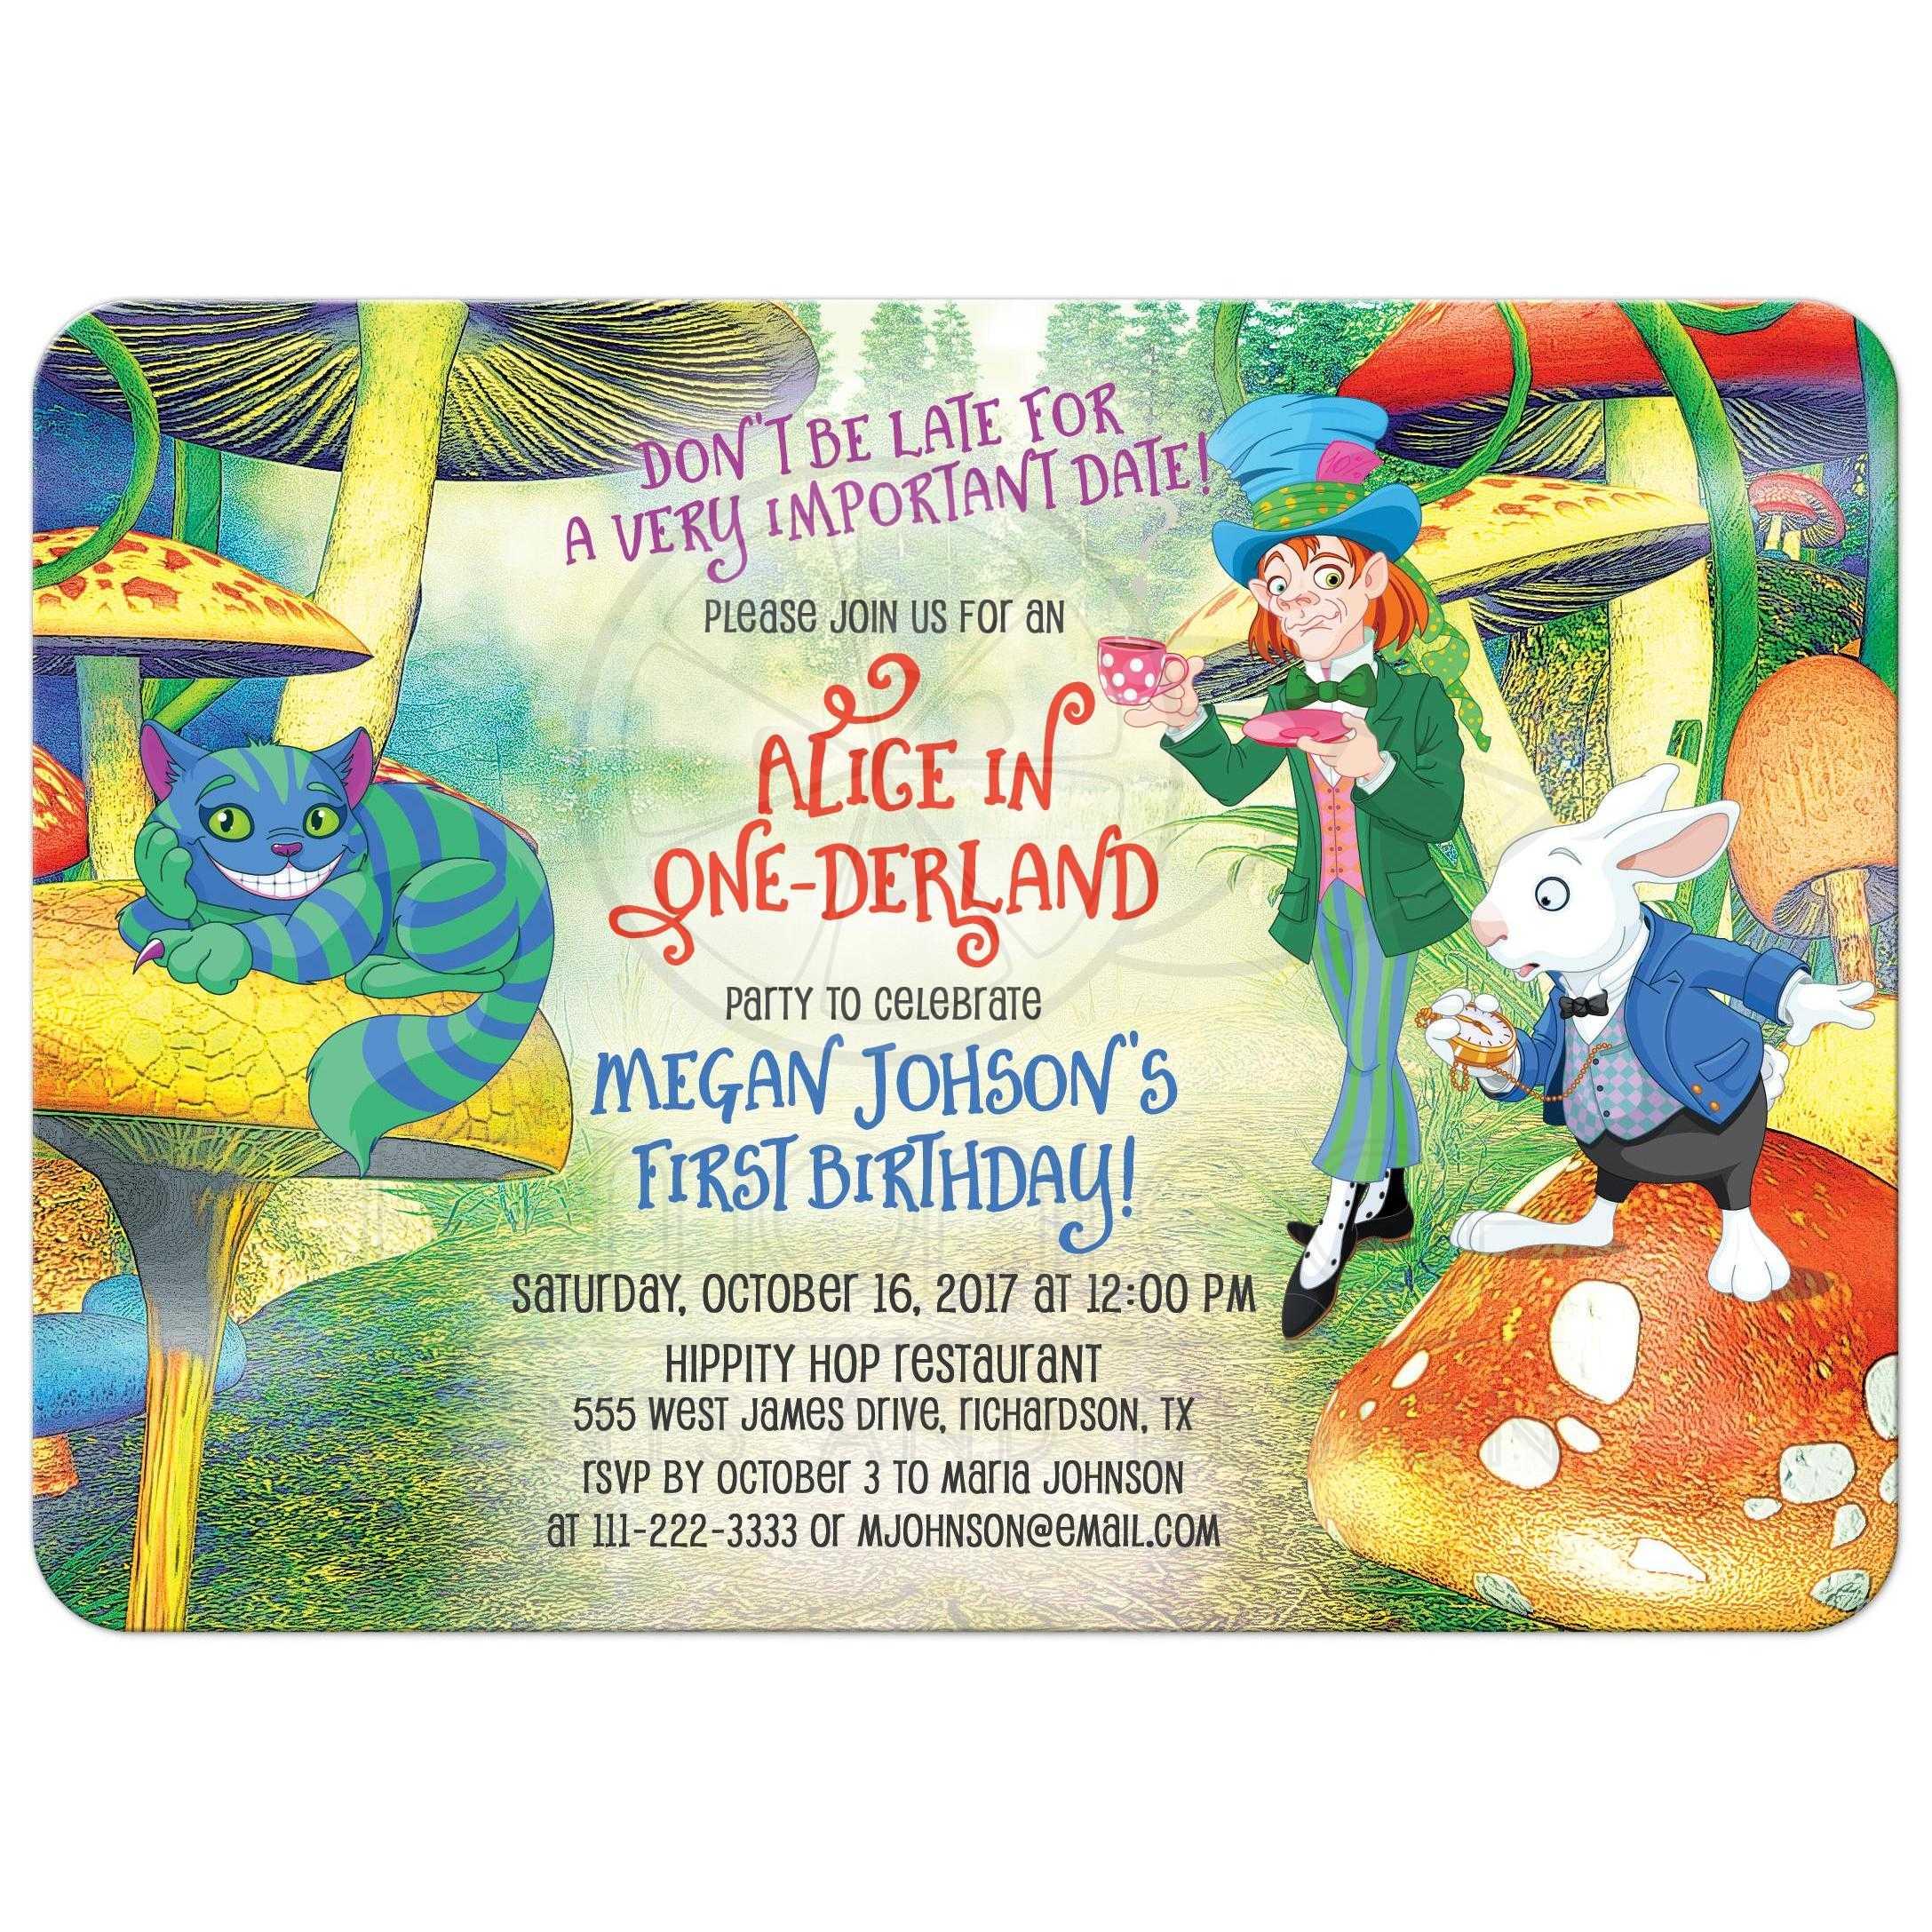 Alice in wonderland 1st birthday party invitation cheshire cat mad hatter alice in wonderland 1st birthday invitation stopboris Gallery